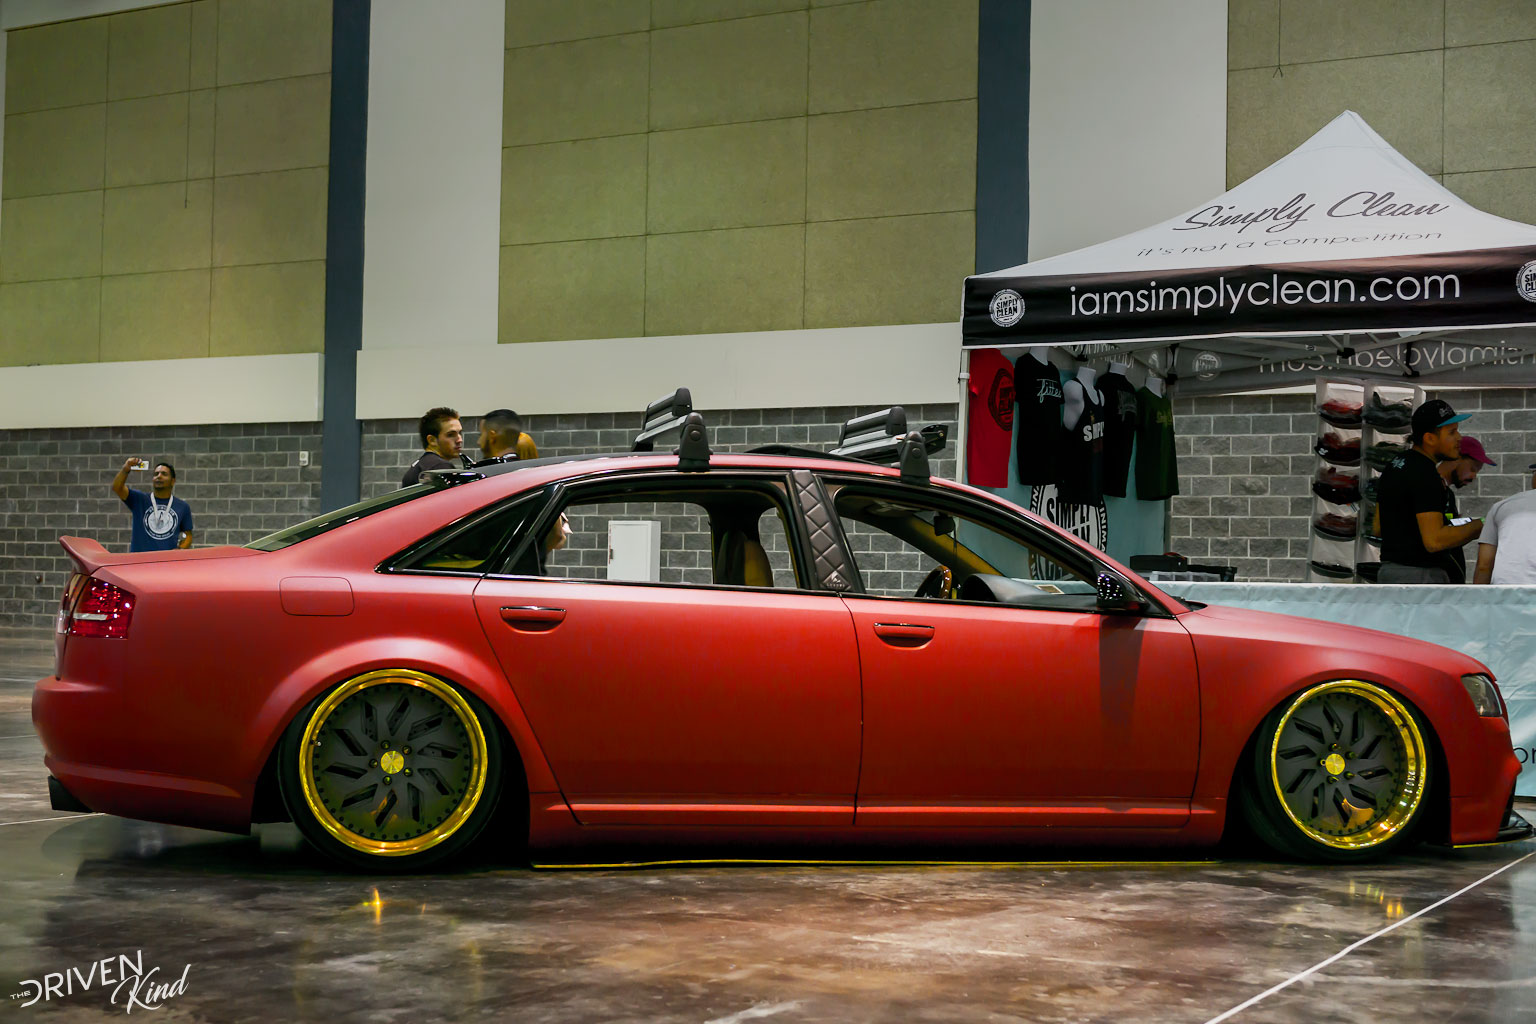 Acura STANCENATION FLORIDA PALM BEACH CONVENTION CENTER 2017 Pt. 2 The Driven Kind Coverage